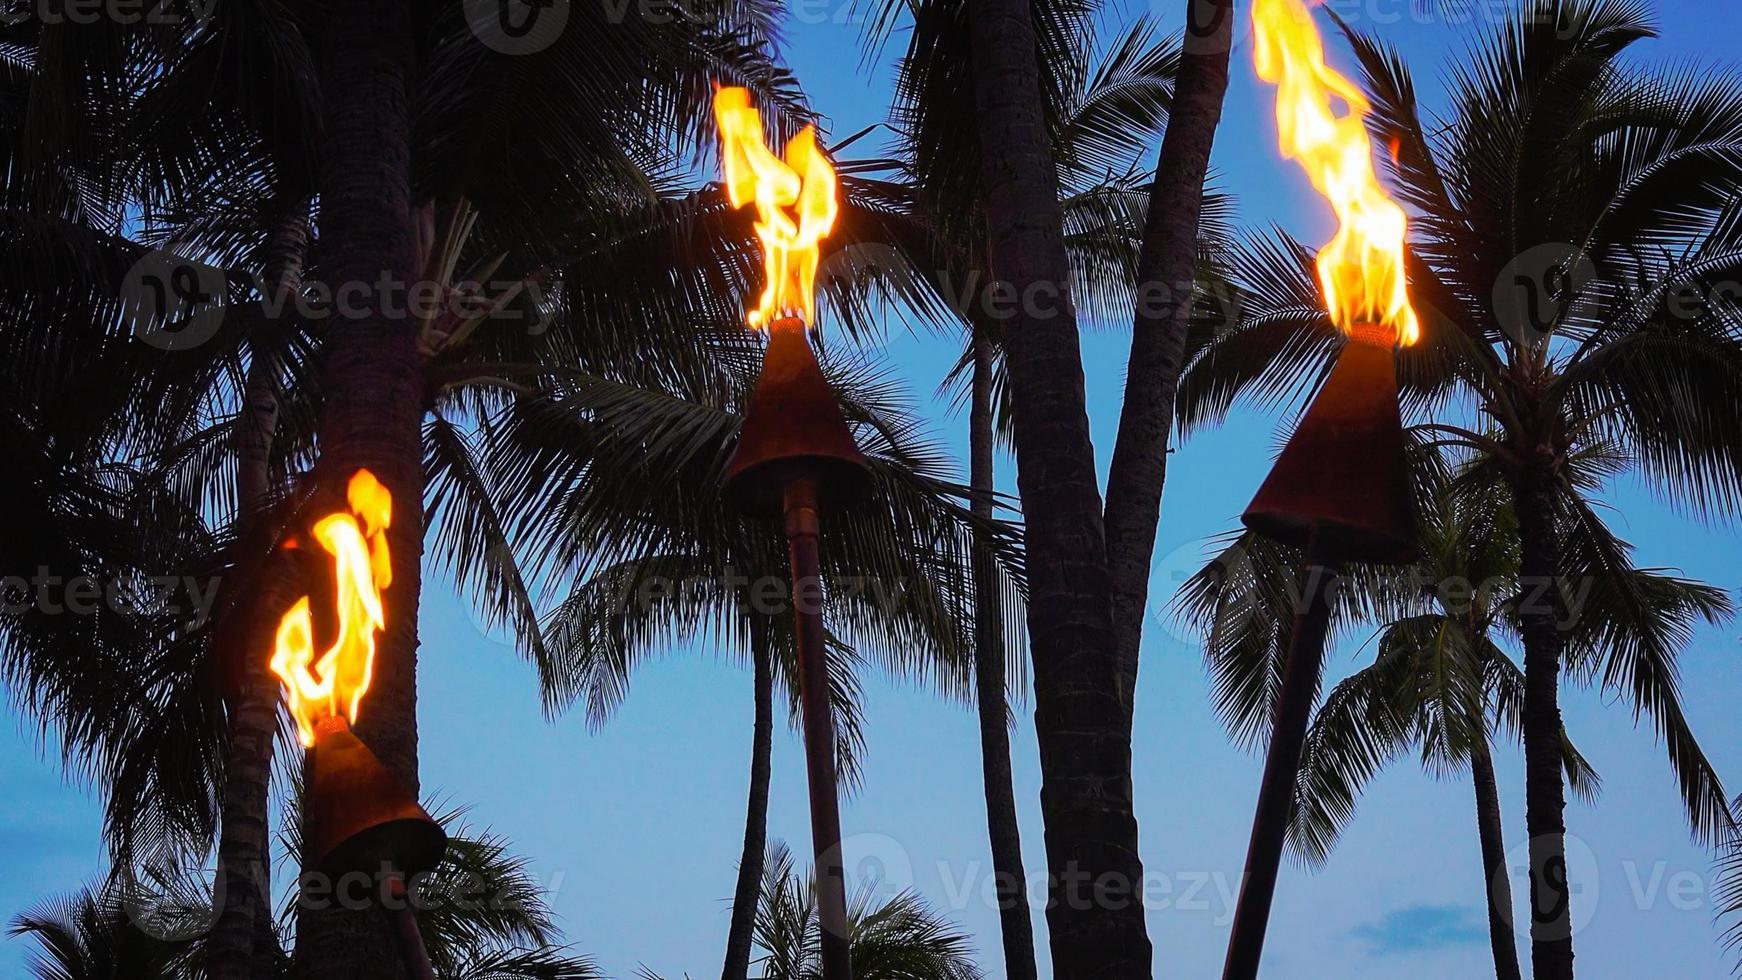 torches tiki brûlant sur la plage de waikiki la nuit photo